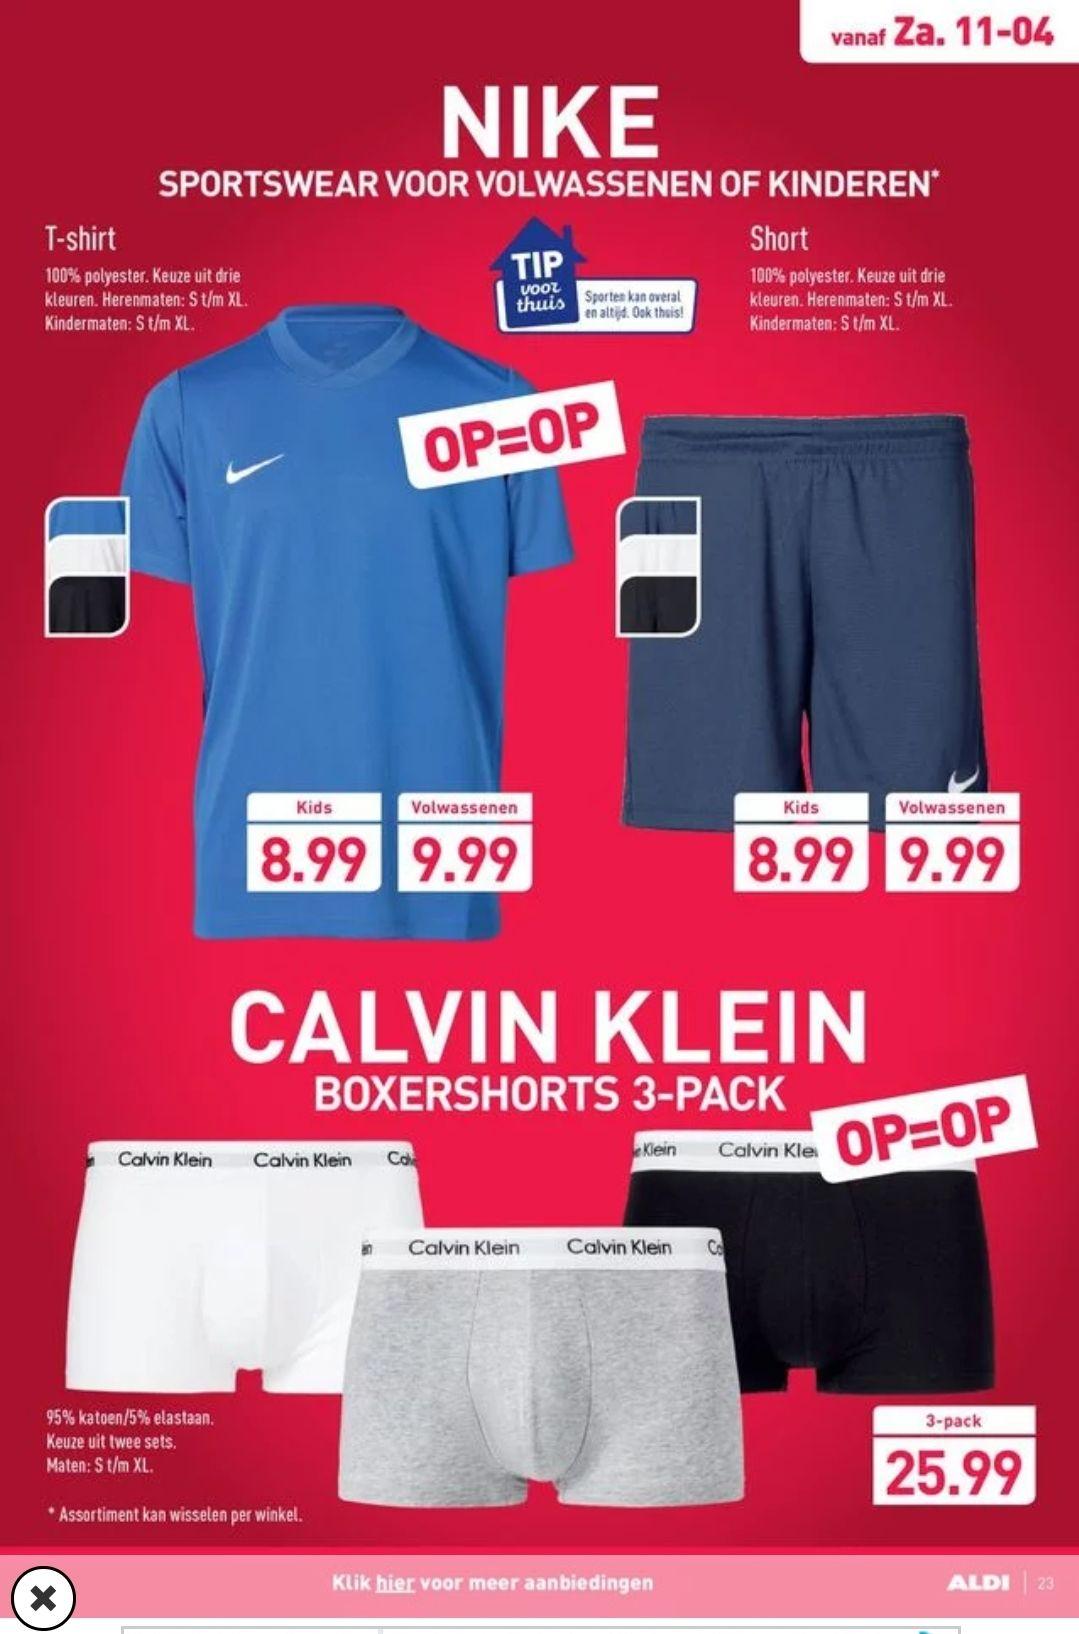 Nike t-shirt en short 9.99 ps, Calvin Klein 3 pack 25.99